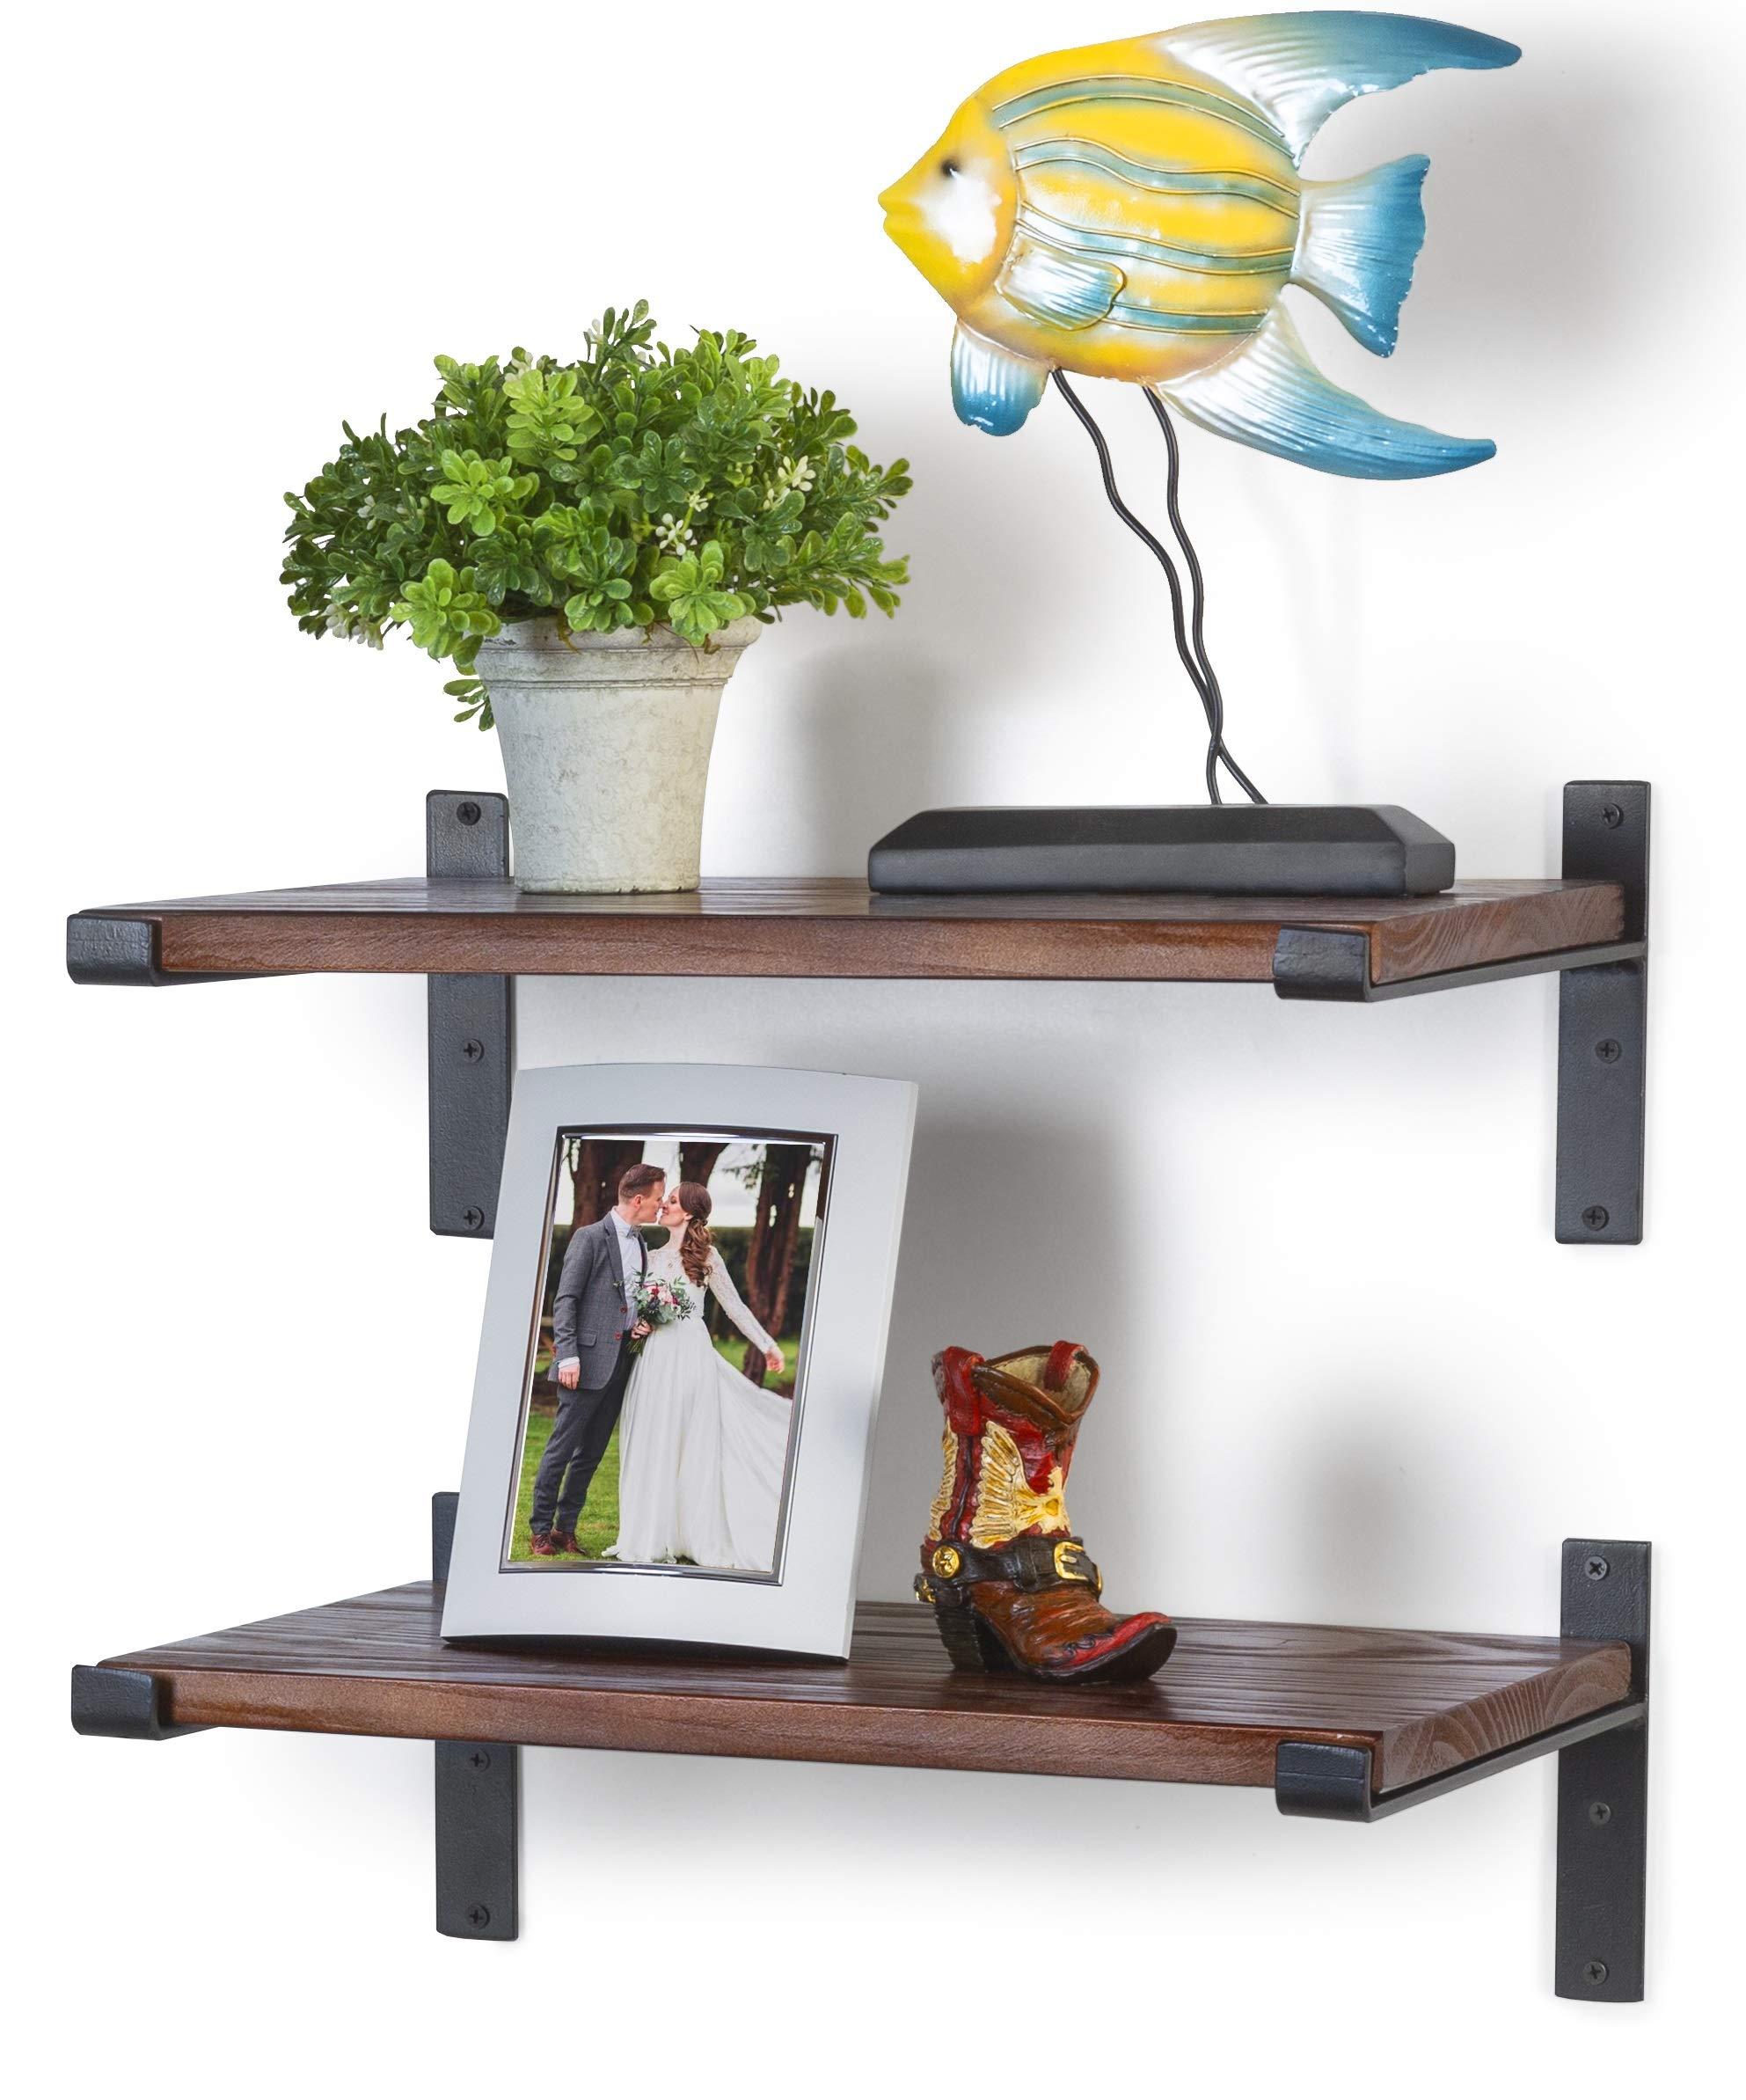 Premium Home Decor Rustic Floating Shelves: Industrial Wall Mounted Shelving, Real Farmhouse Wood Shelf, (Light Mahogany) Shelf for Living Room Display, Kitchen, Bedroom Bookshelf, or Bathroom.